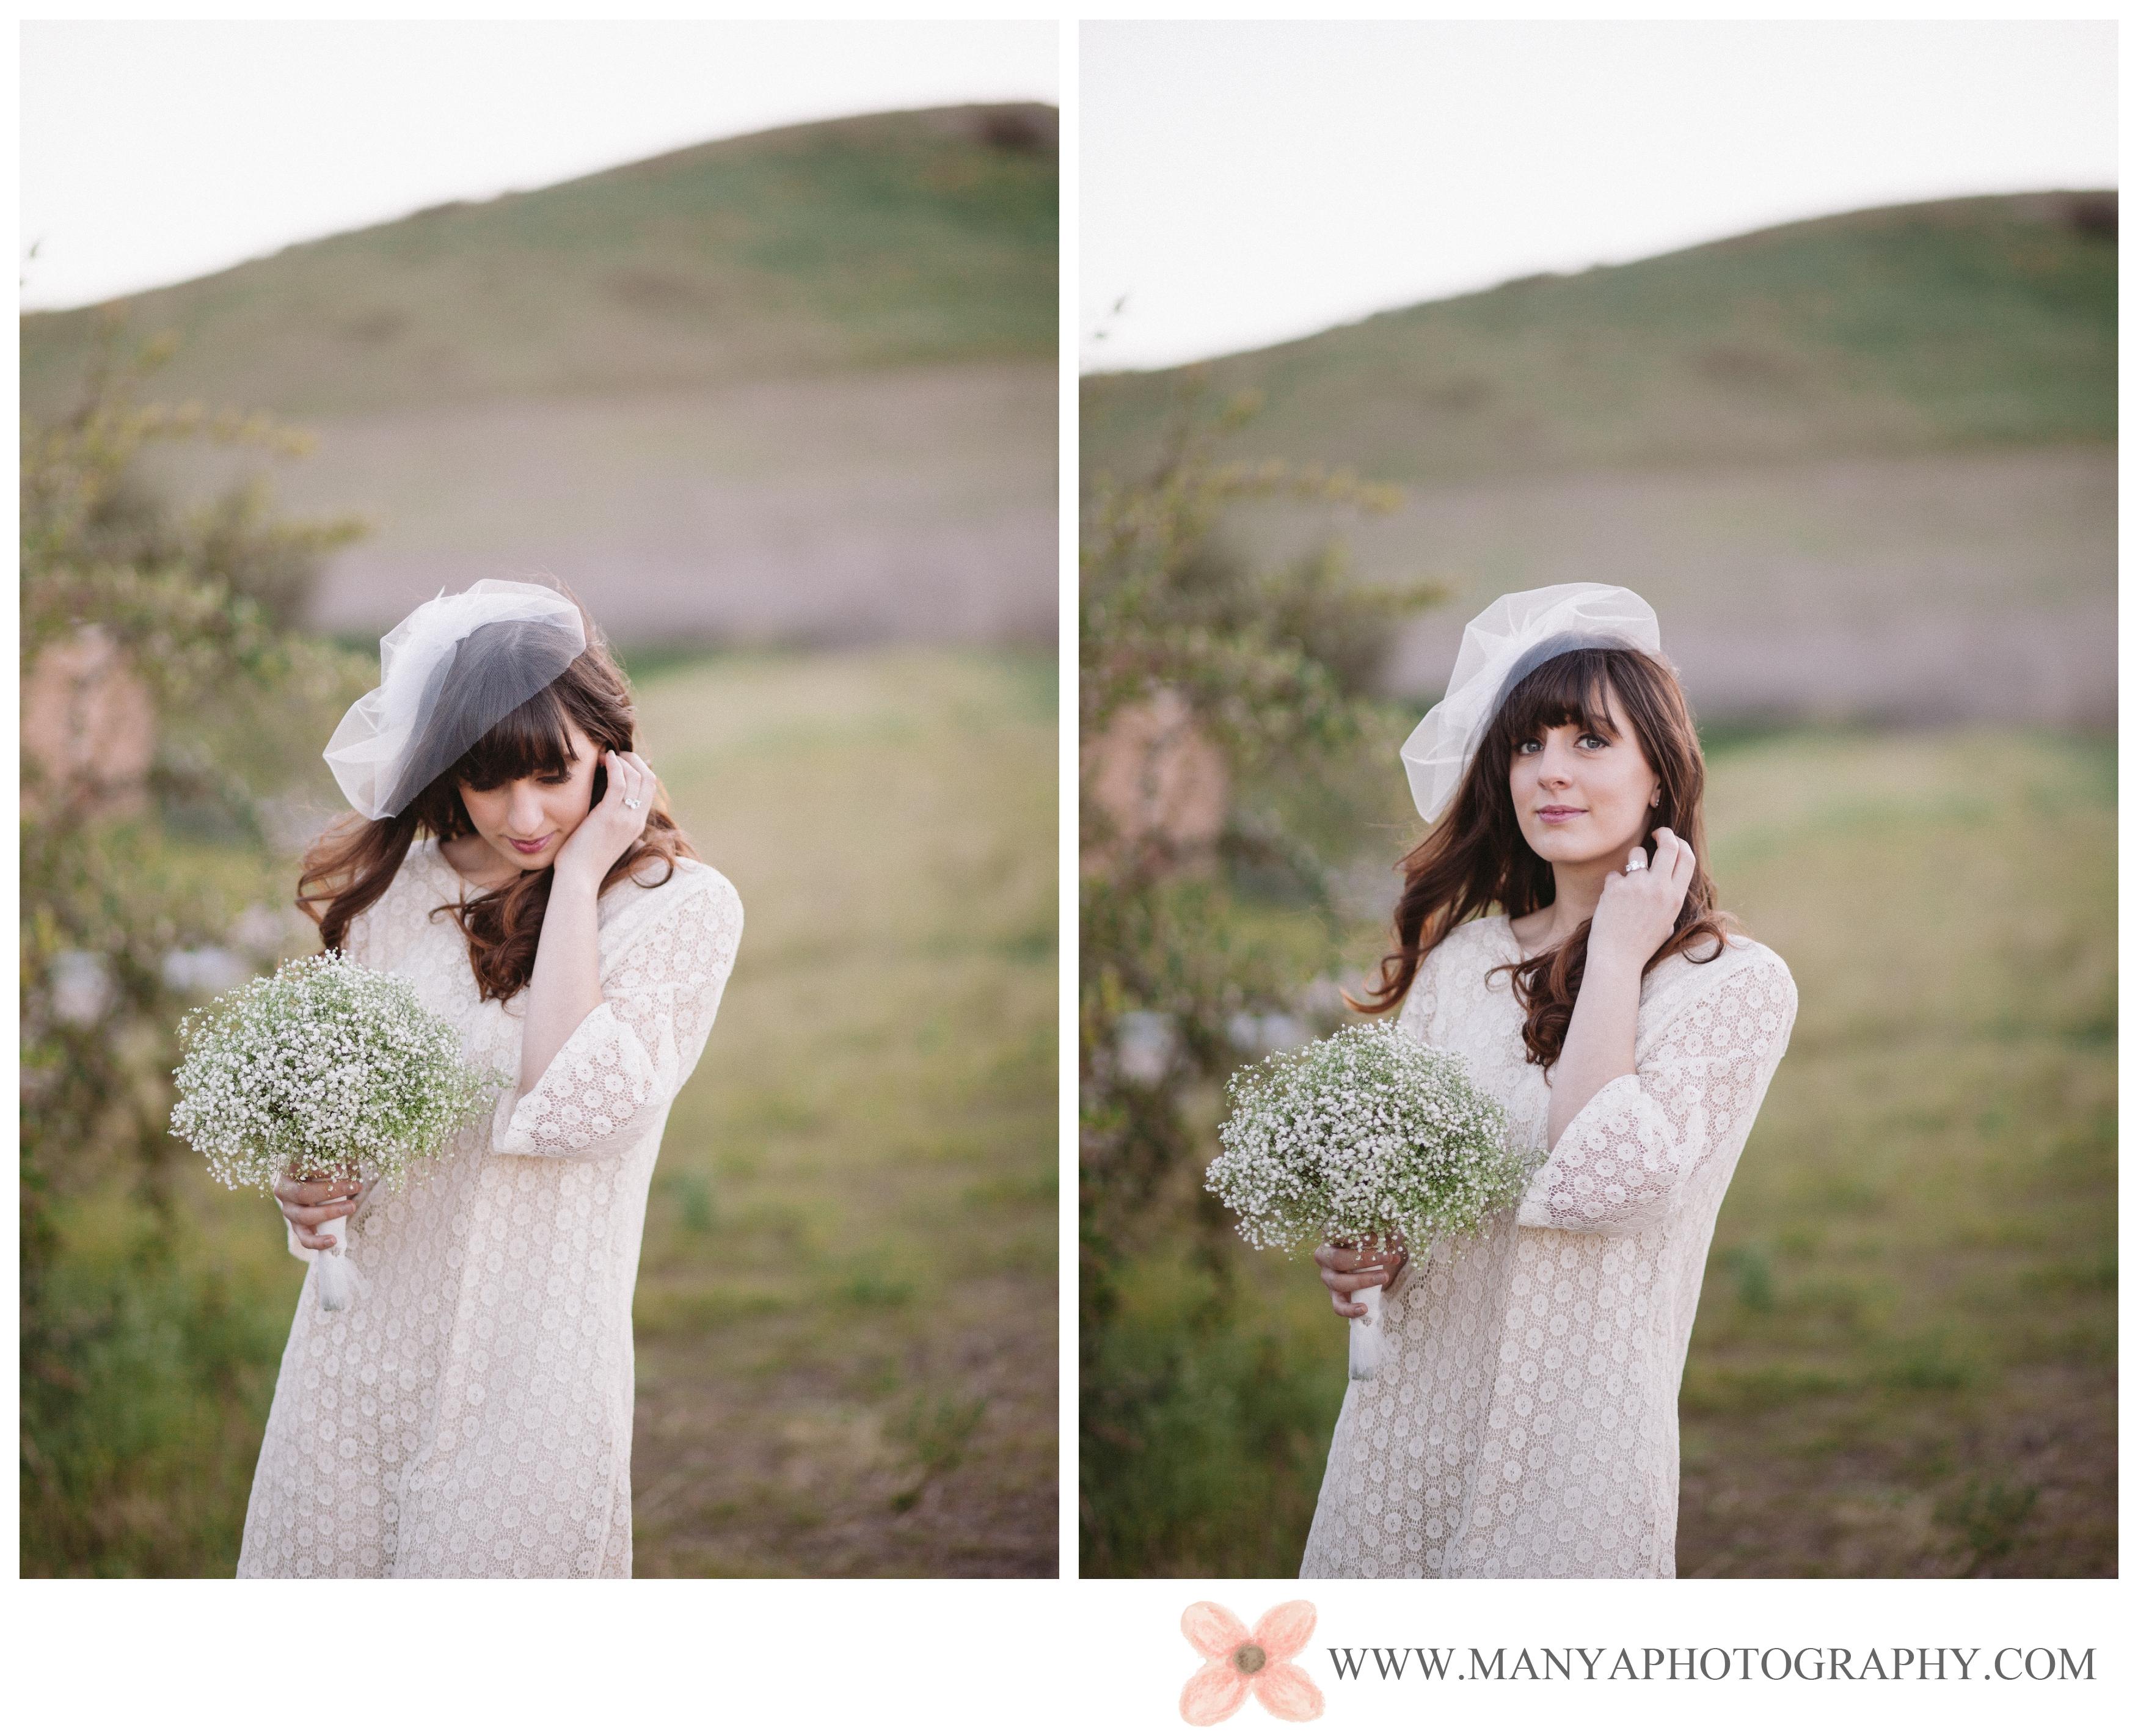 2013-05-22_0005 Ruche Inspired Bridal Shoot - Orange County Wedding Photographer